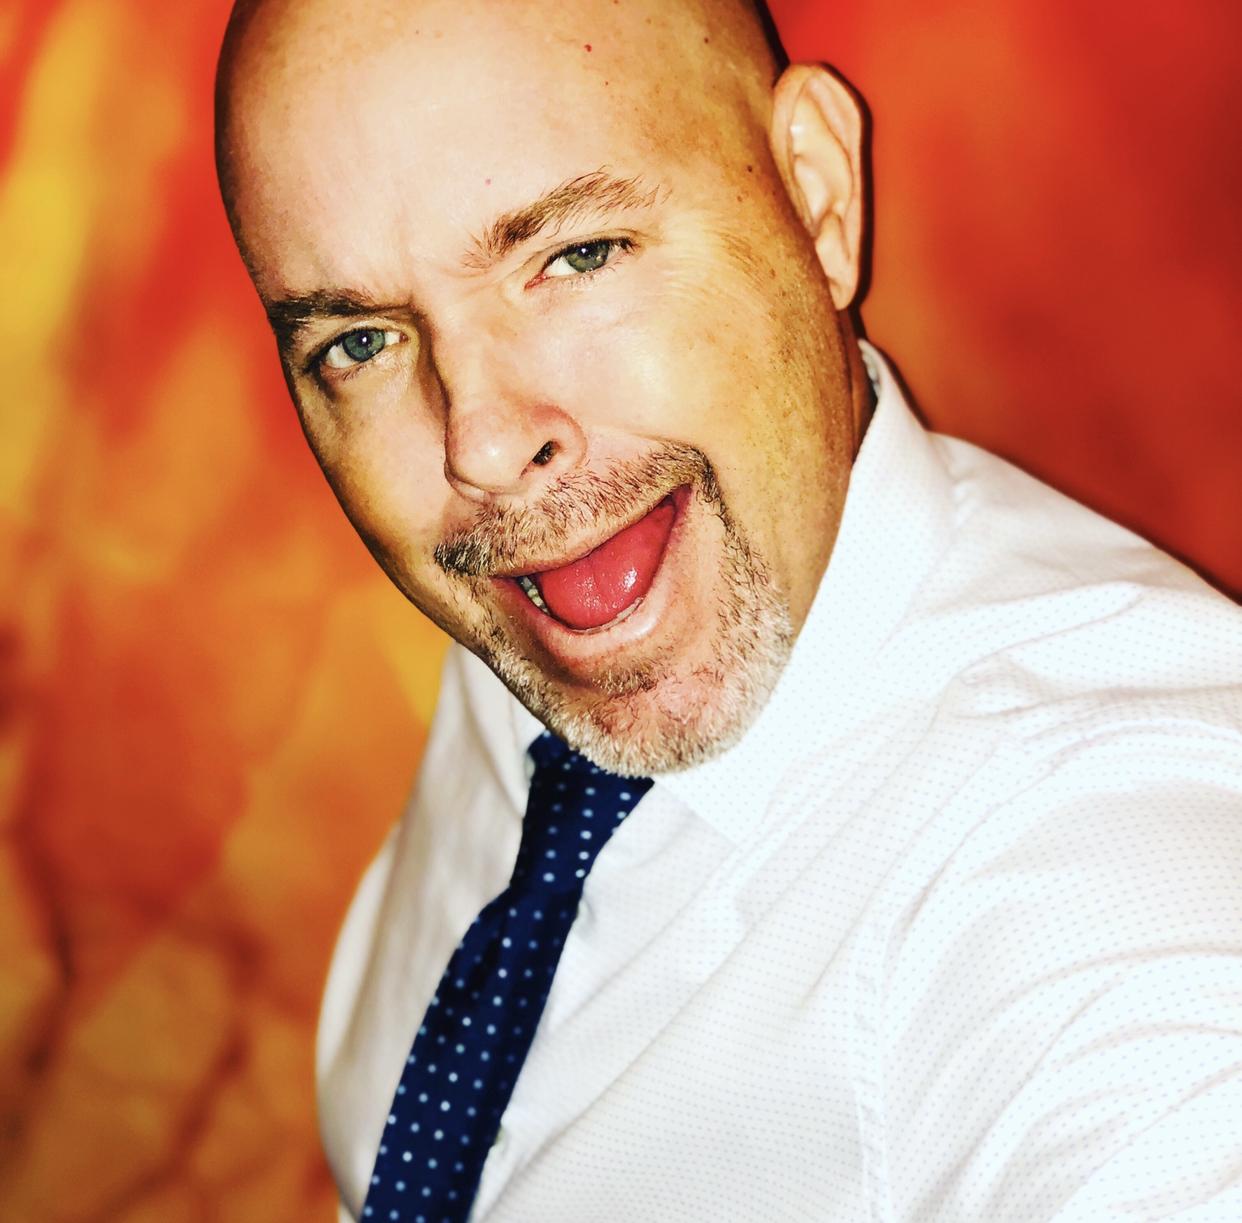 @drbradklontz profile image